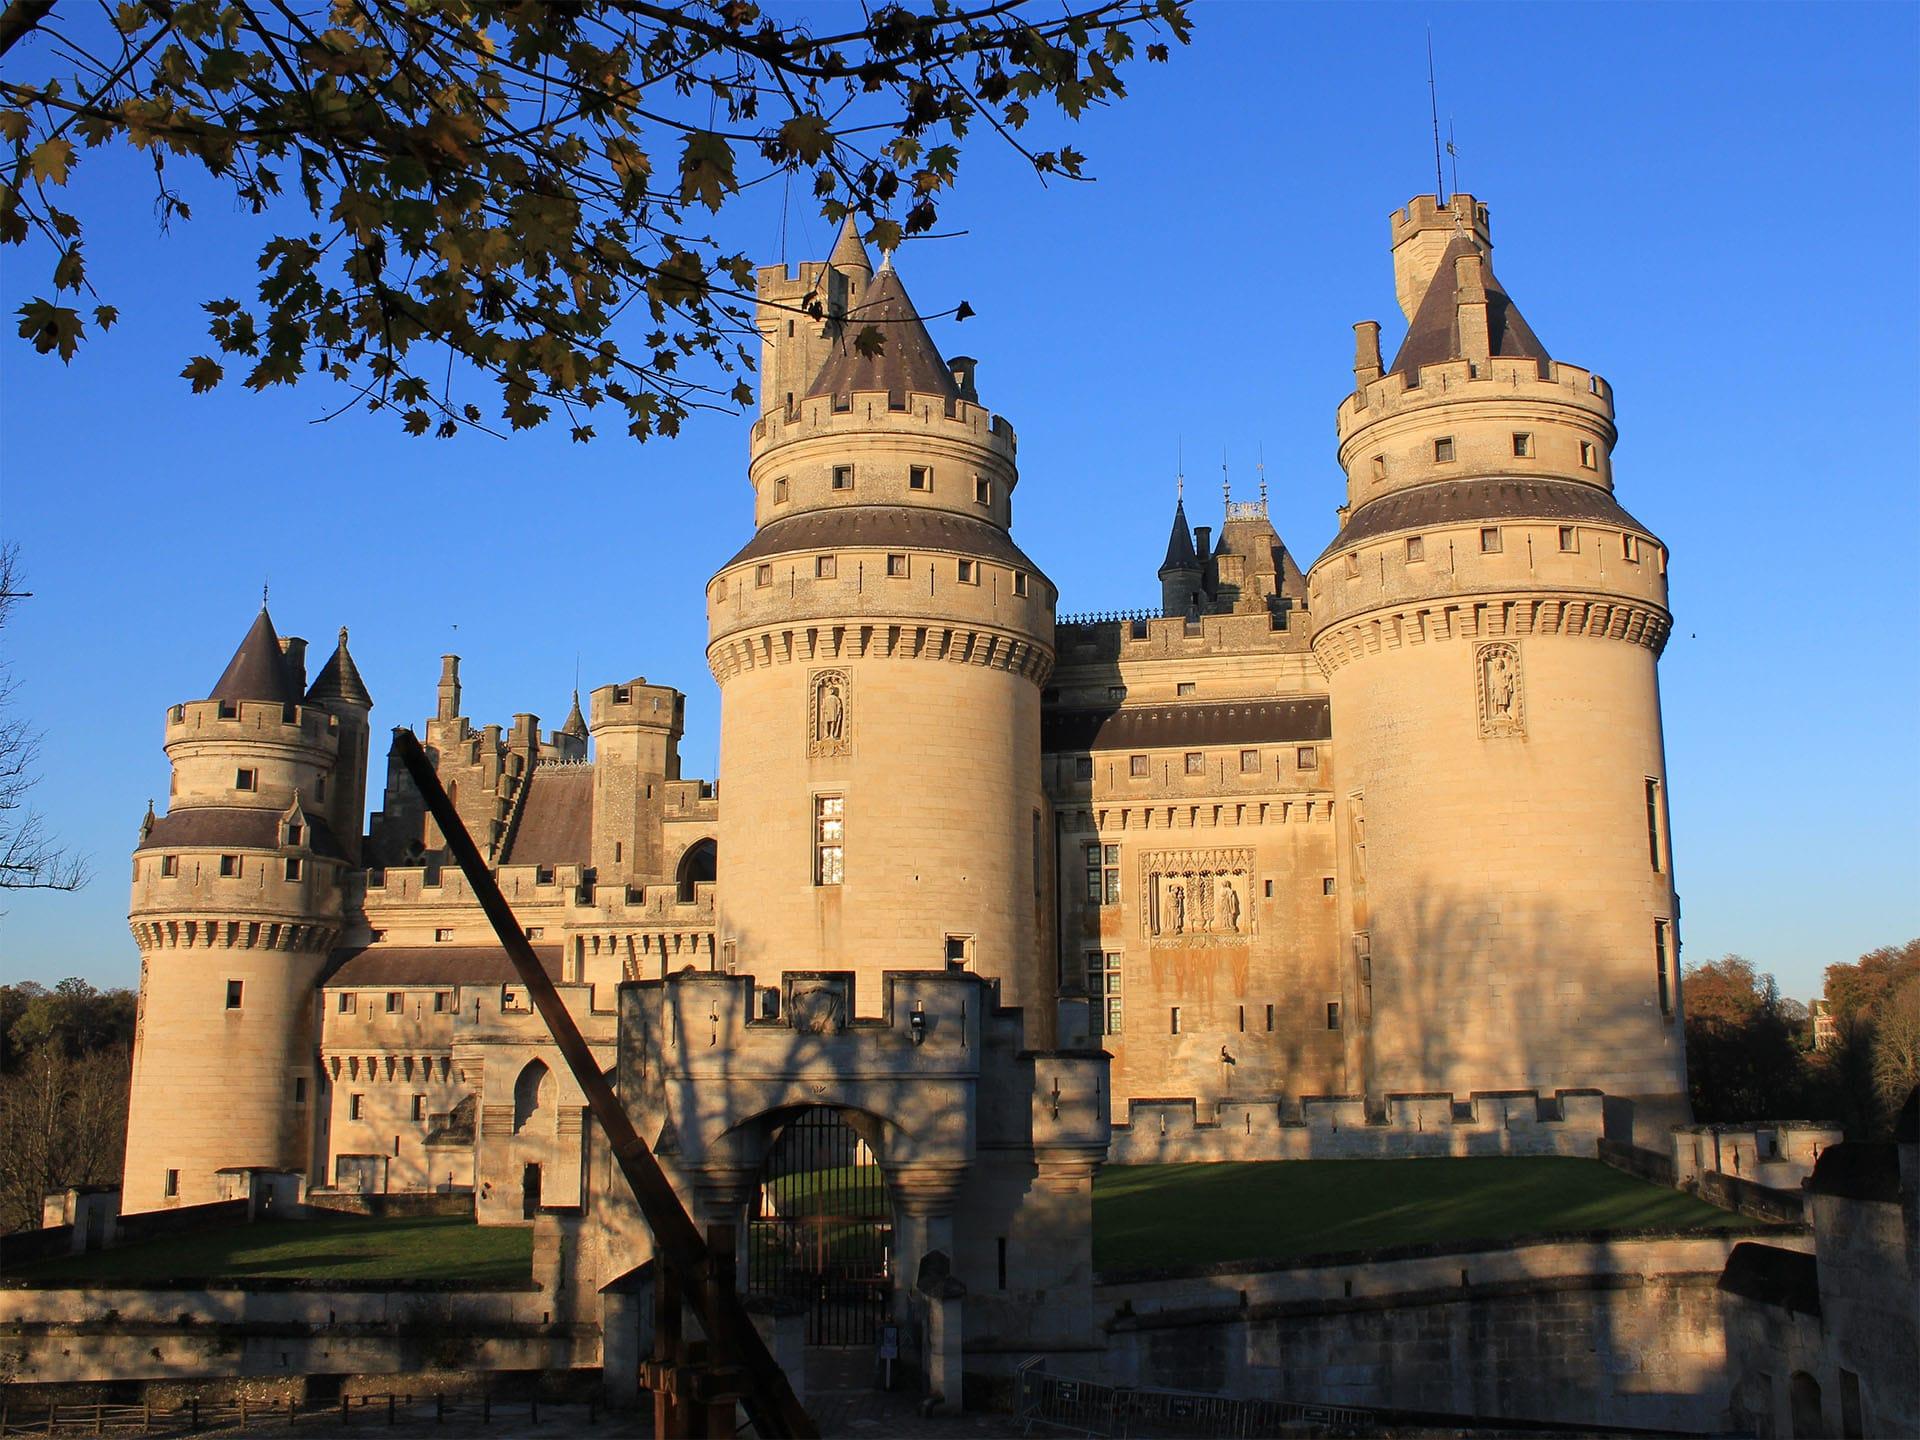 Pierrefonds_chateau